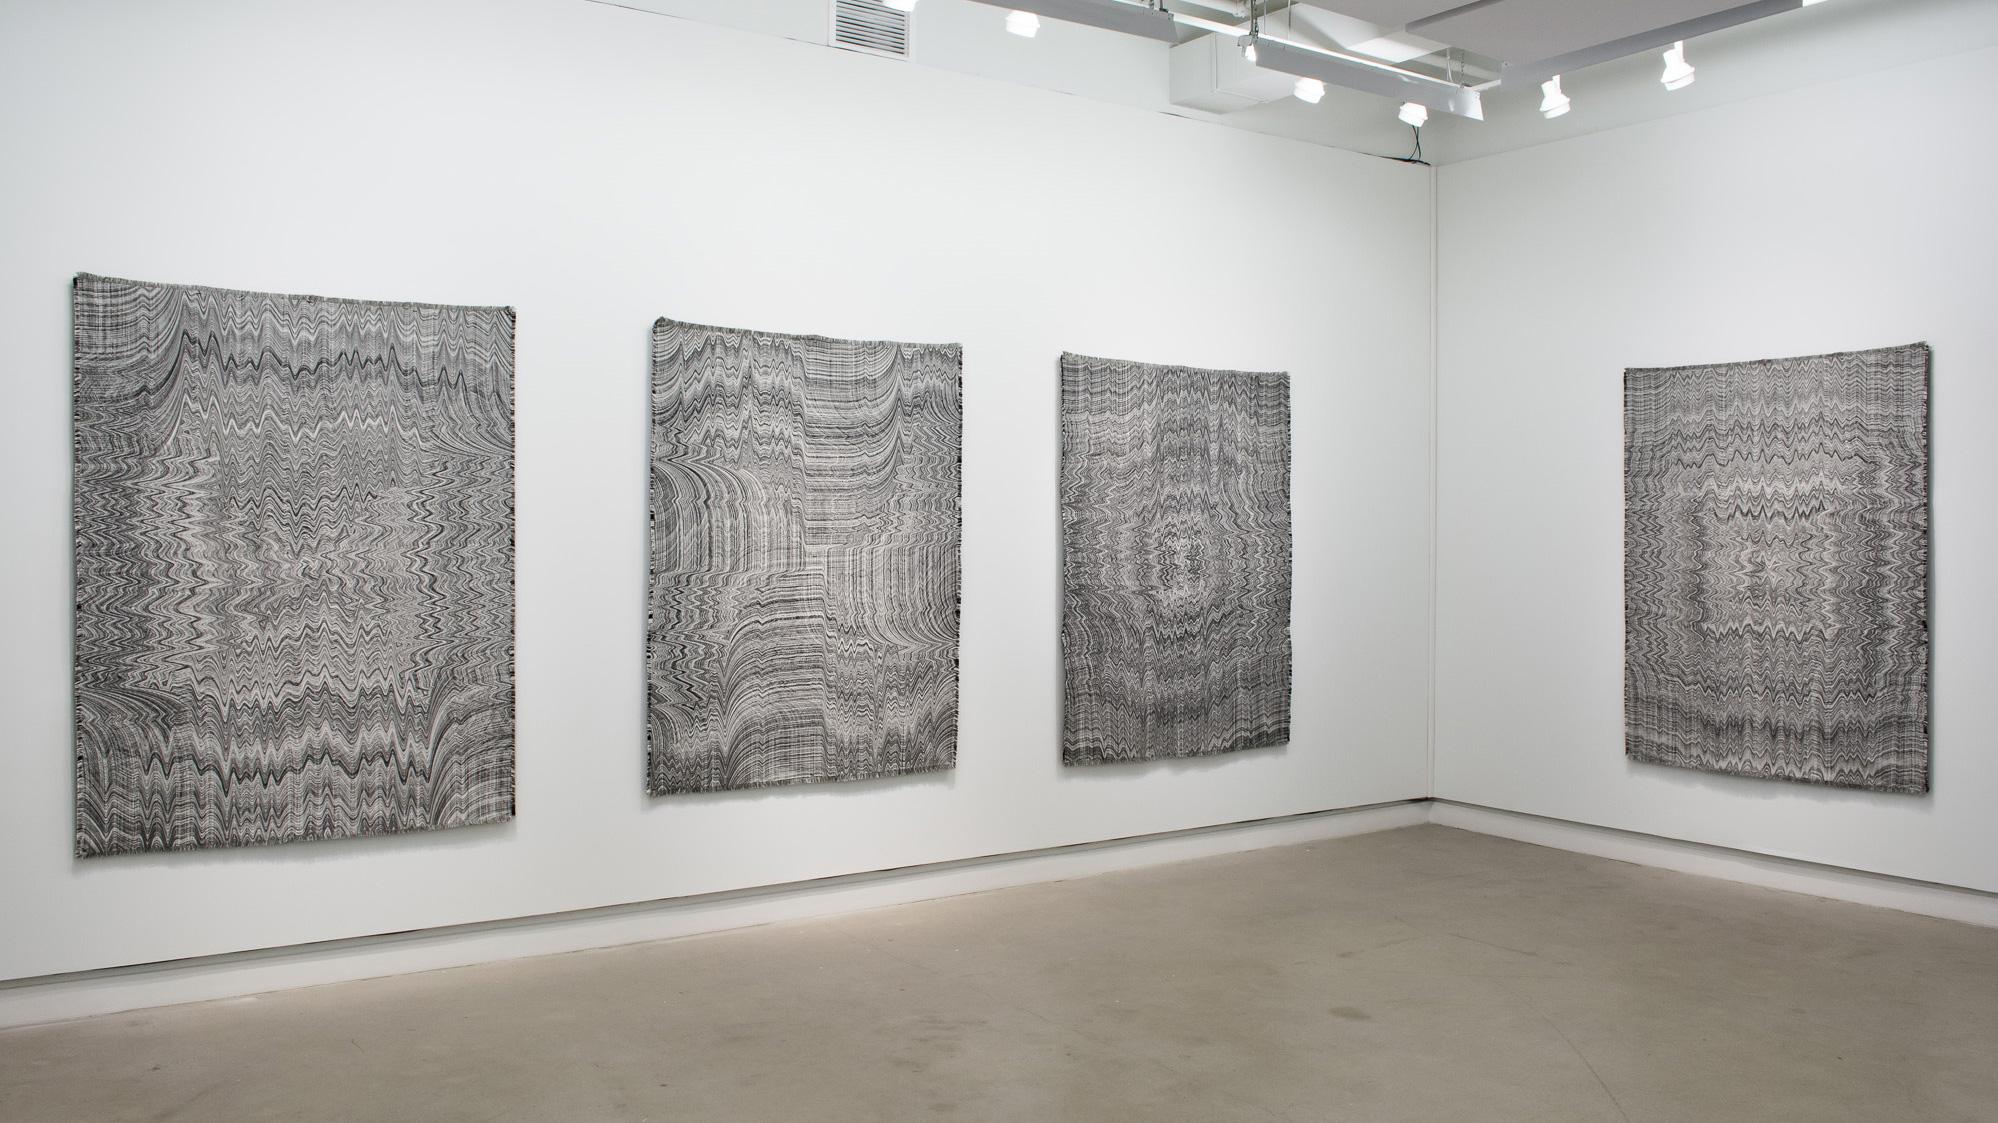 RECENT SOLO EXHBITION—MONTRÉAL - Laura Splan: Embodied ObjectsMarch 15–April 21, 2018Occurrence Gallery, Montréal, QCEXHIBITION CATALOGINSTALLATION VIEWS